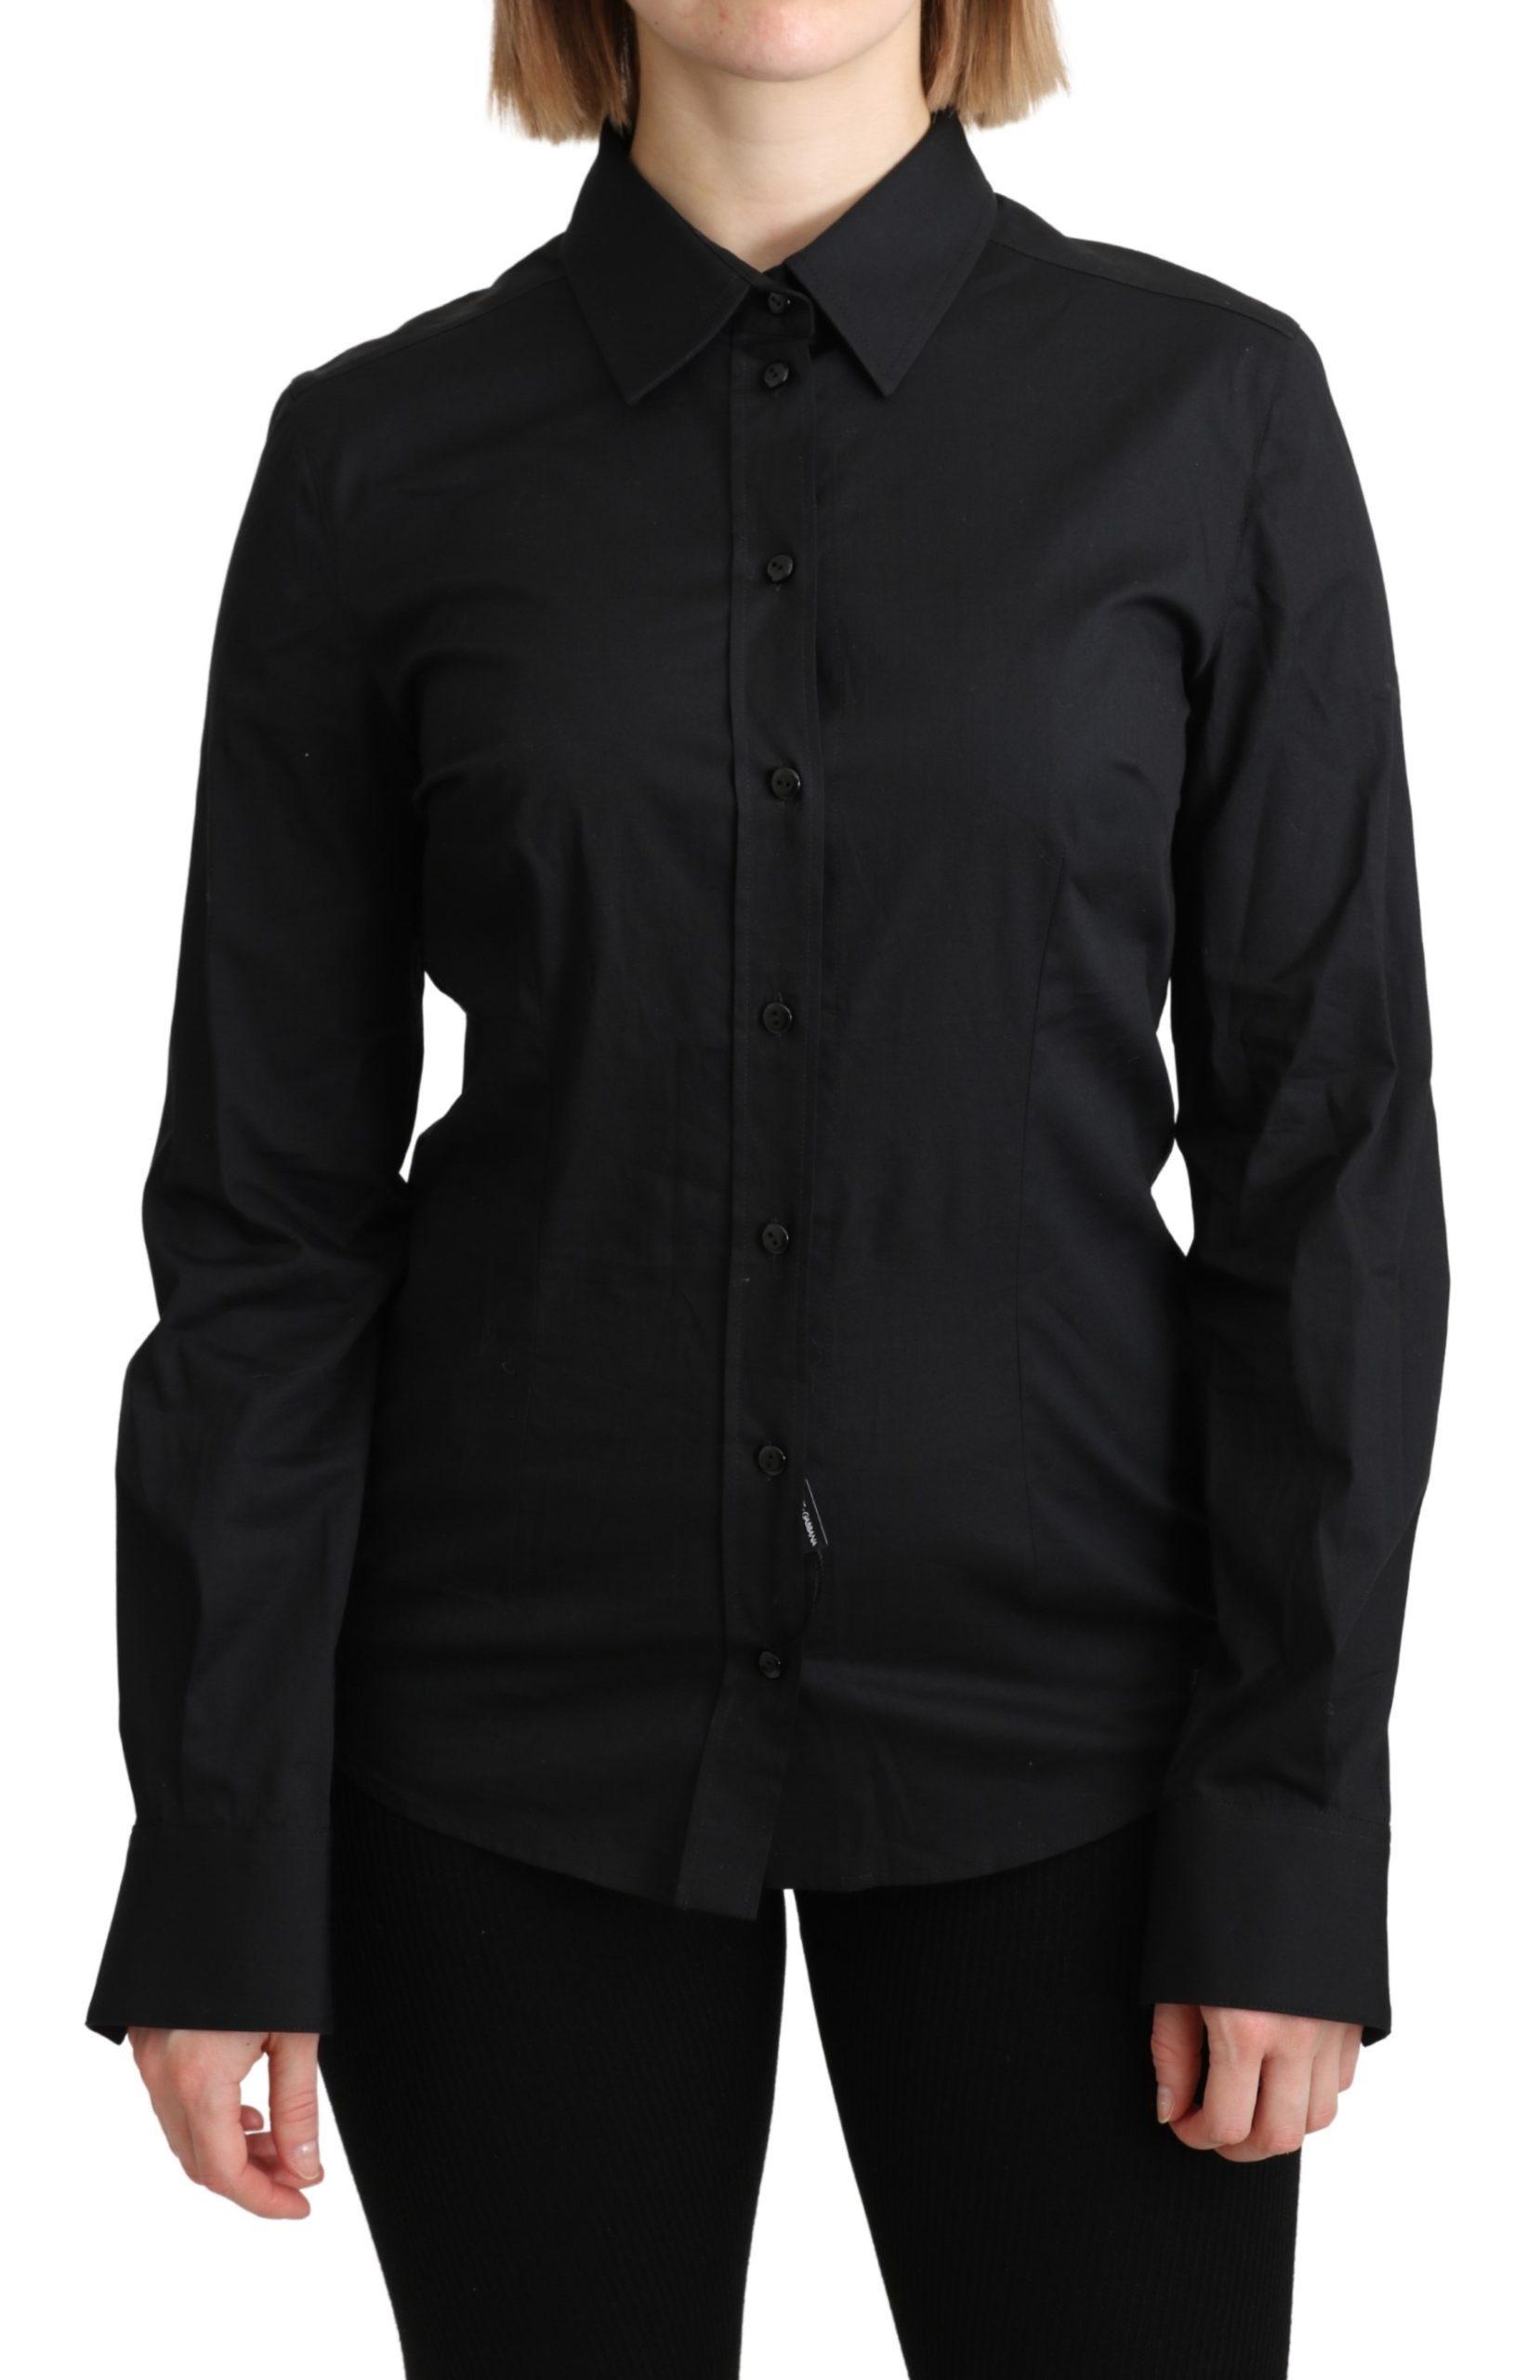 Dolce & Gabbana Women's Formal Dress Shirt Black TSH4901 - IT42|M